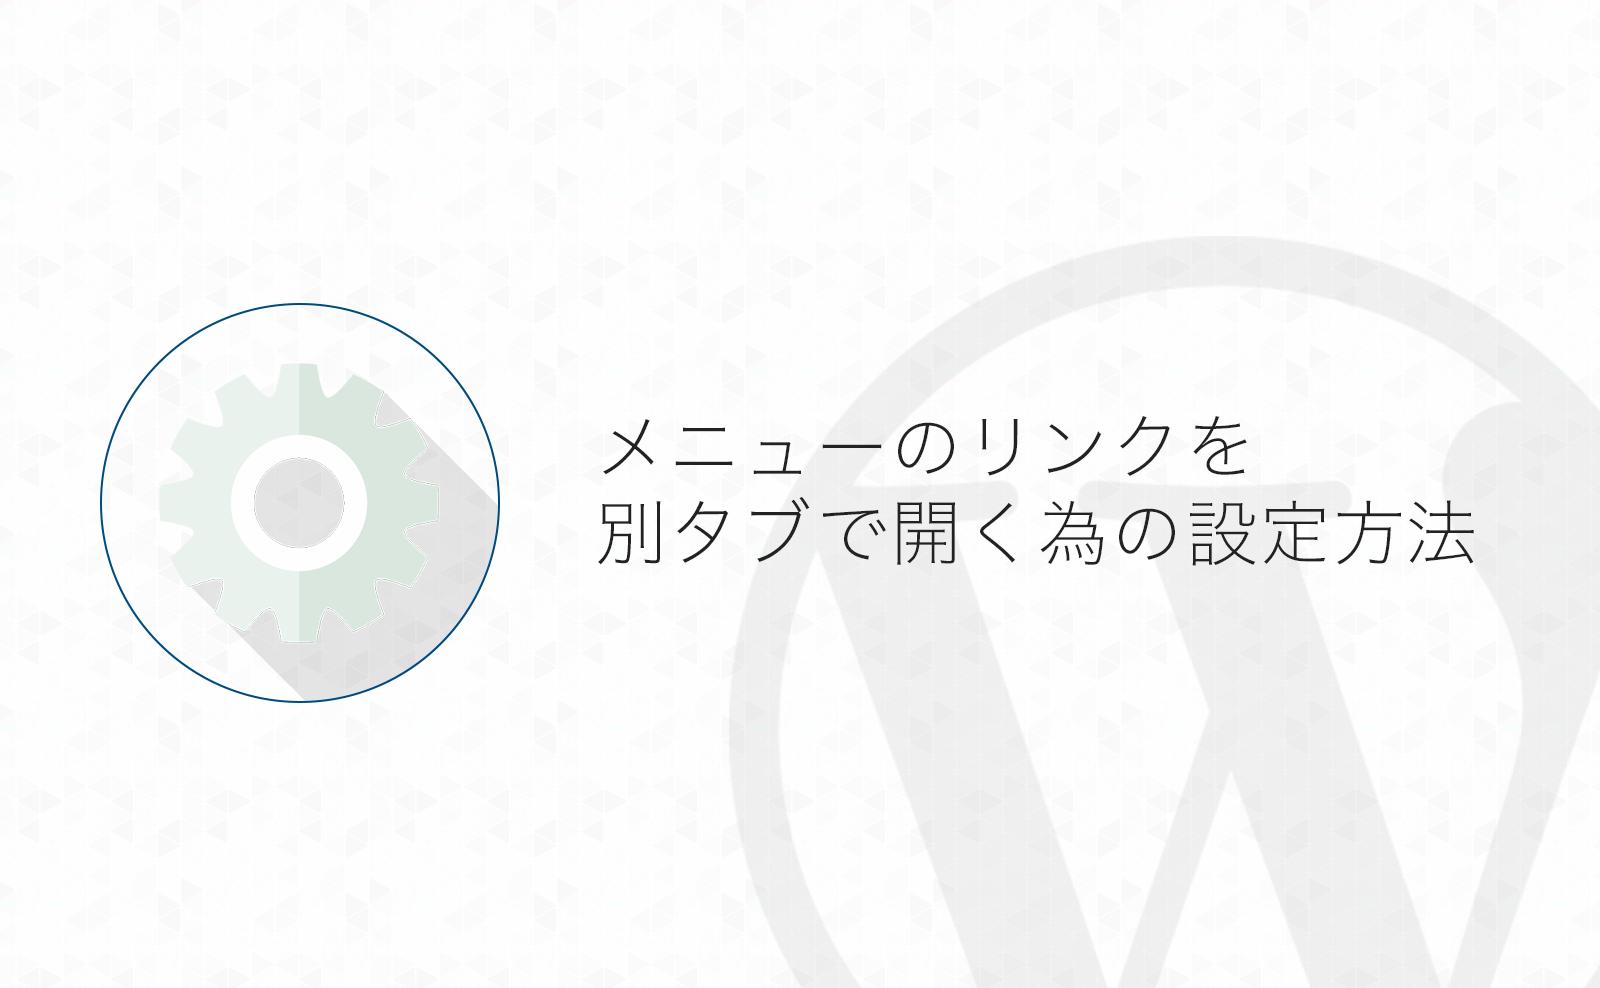 【WordPress】メニューに設定したリンクを別のタブで開くように設定する方法